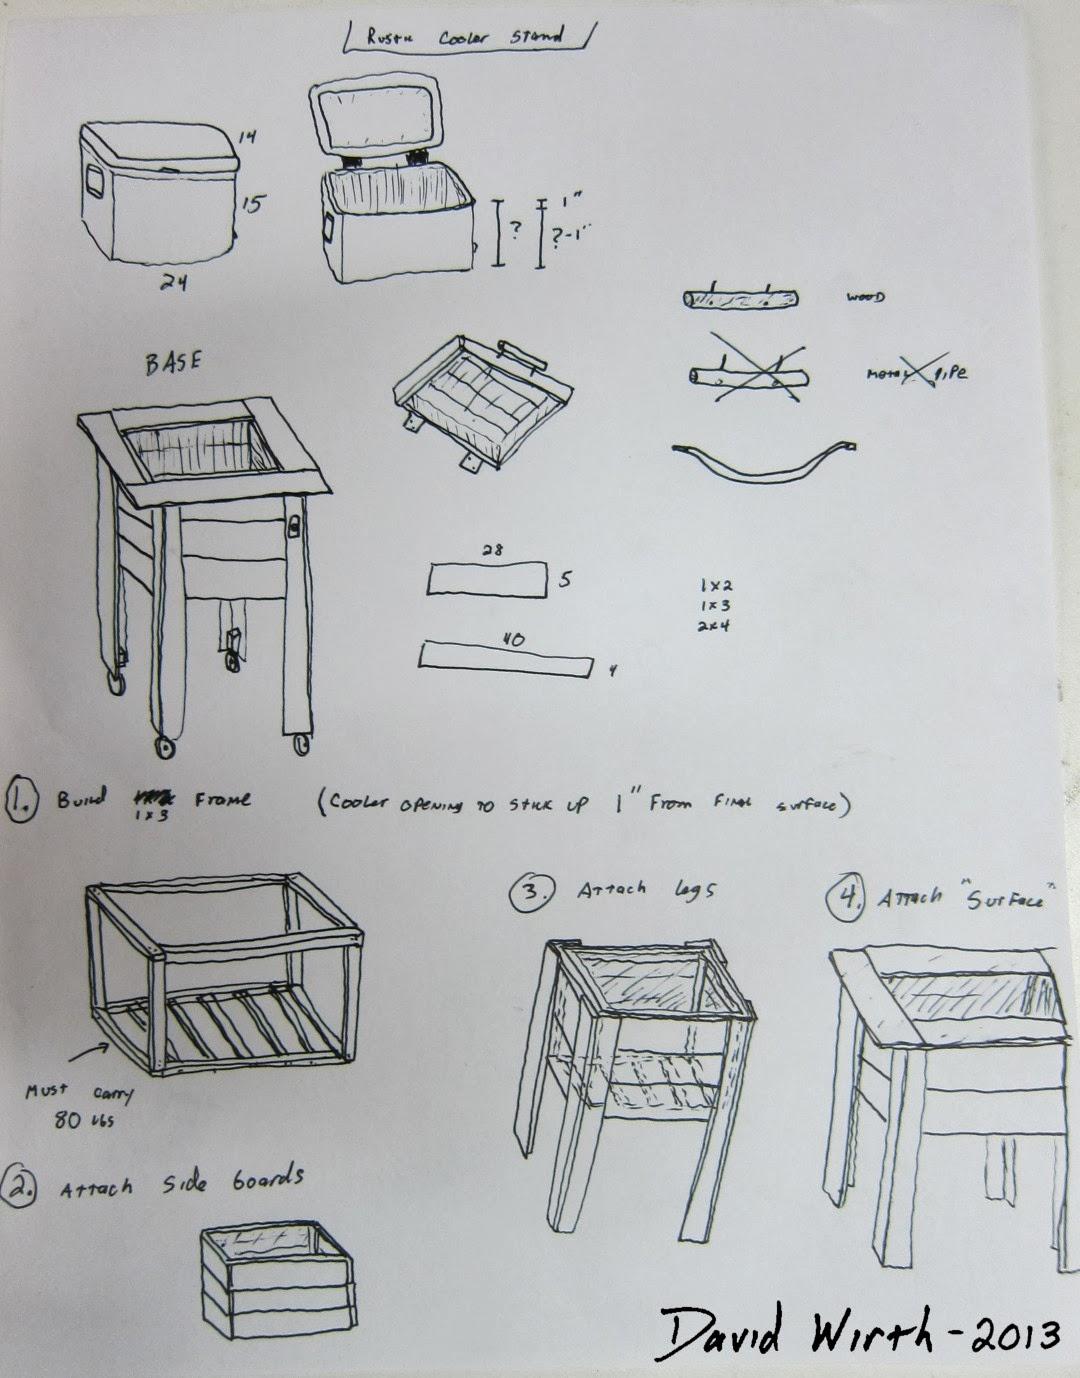 Diy plans wood cooler stand plans pdf download wood curio Pallet boat plans